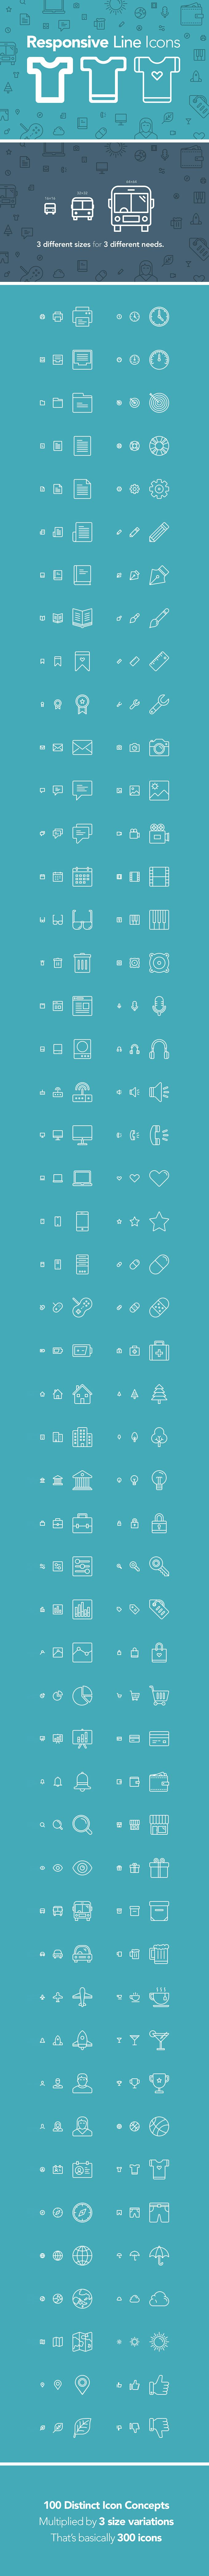 Free 100 Responsive Line Icons | AI, EPS, SVG, PSD (71 MB) By Zlatko Najdenovski on pixelbuddha.net